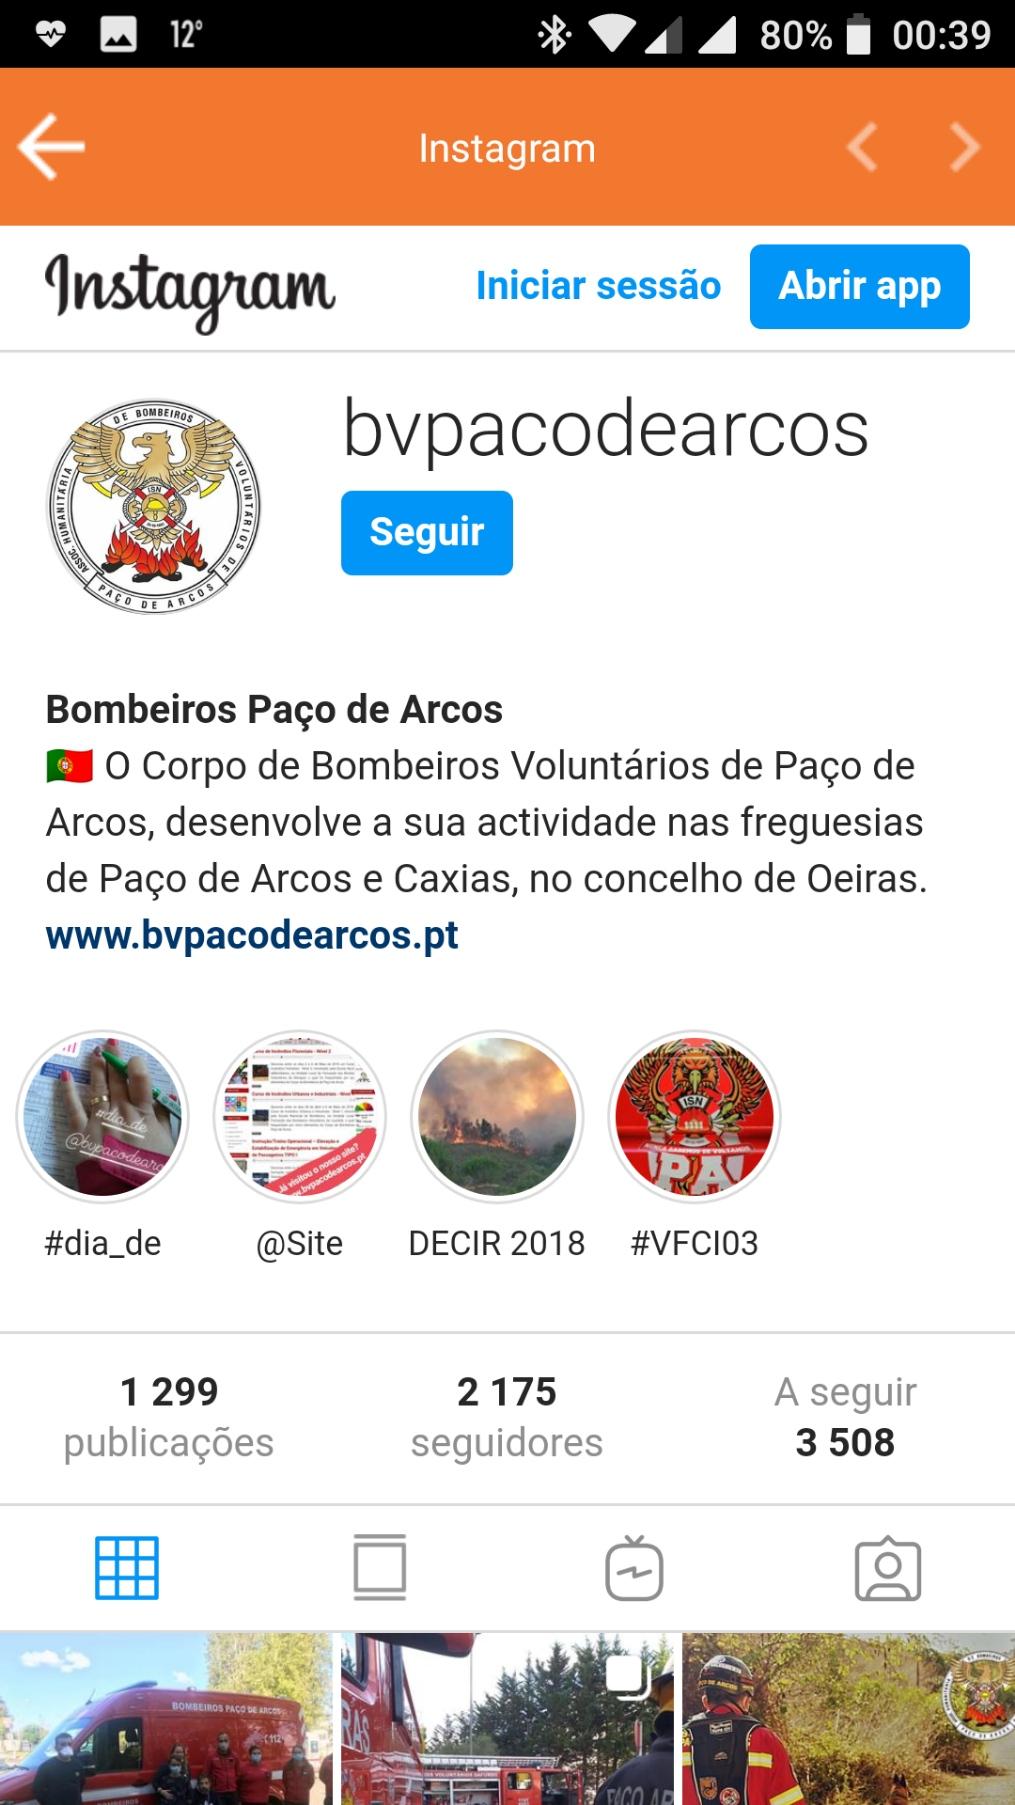 app_bvpacodearcos_20201030 (16)